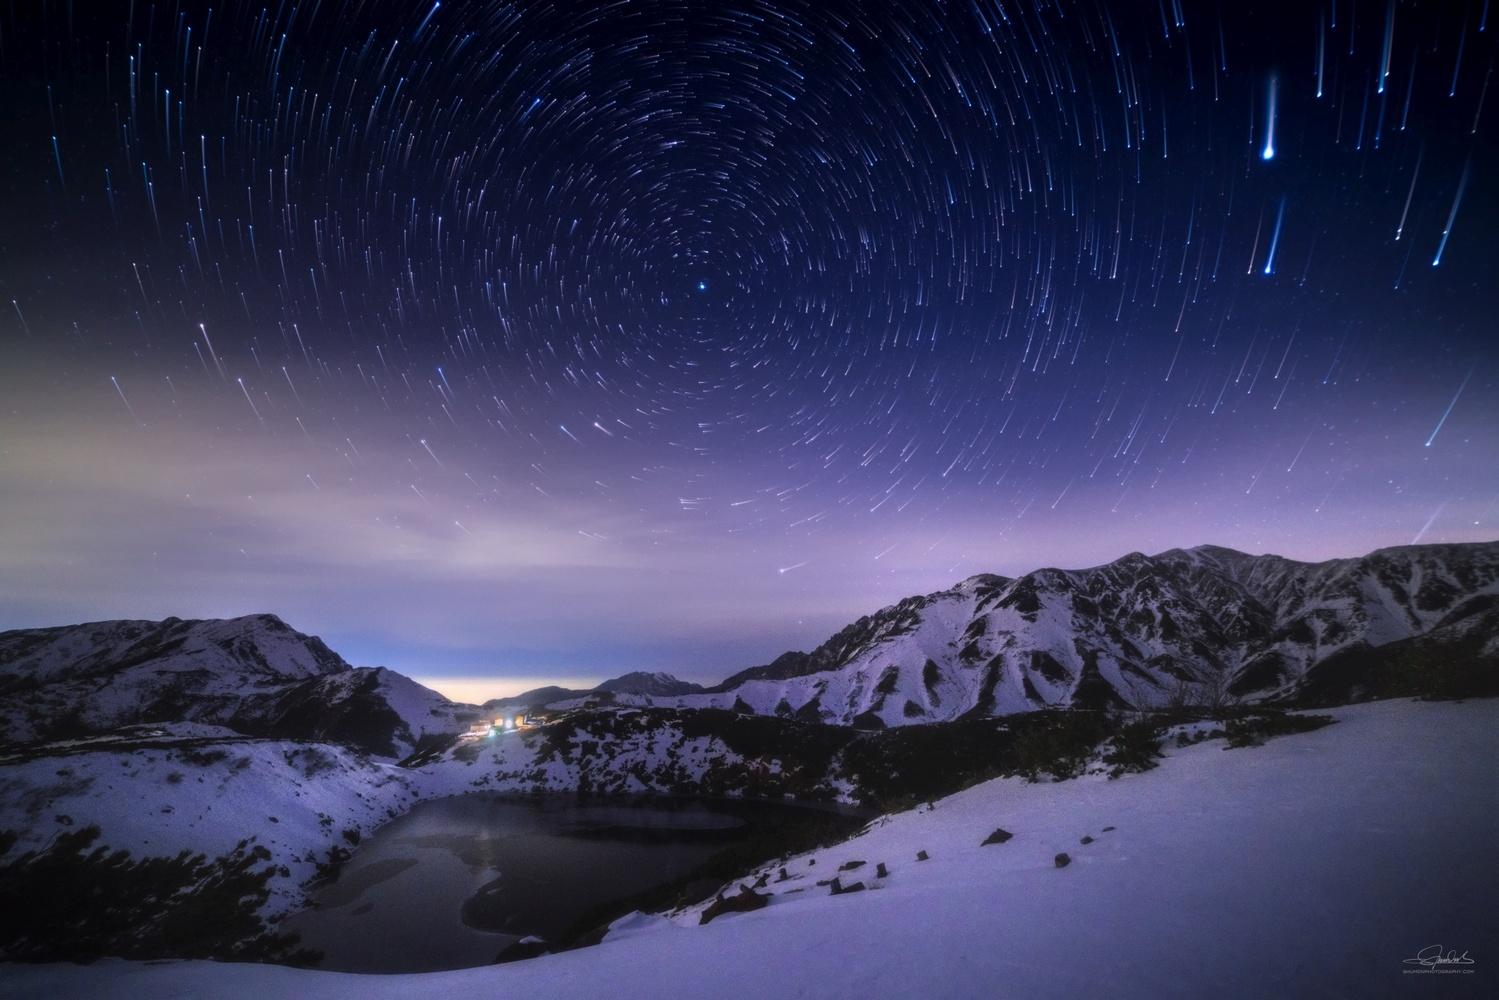 Falling stars by Shumon Saito